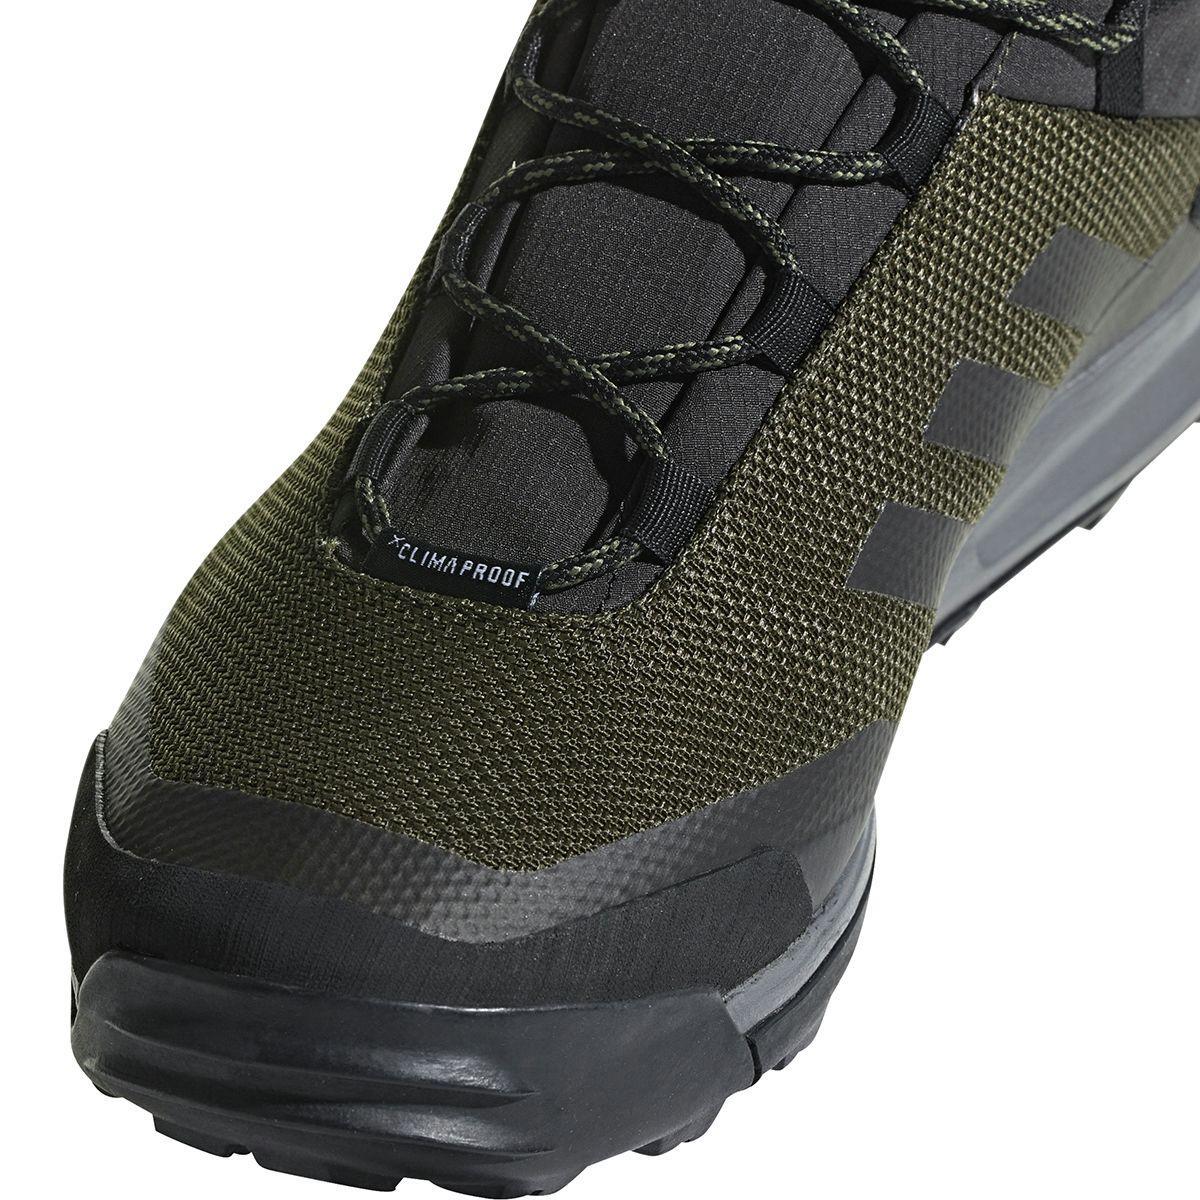 Adidas Outdoor Terrex Tivid Mid CP Hiking Shoe Men's